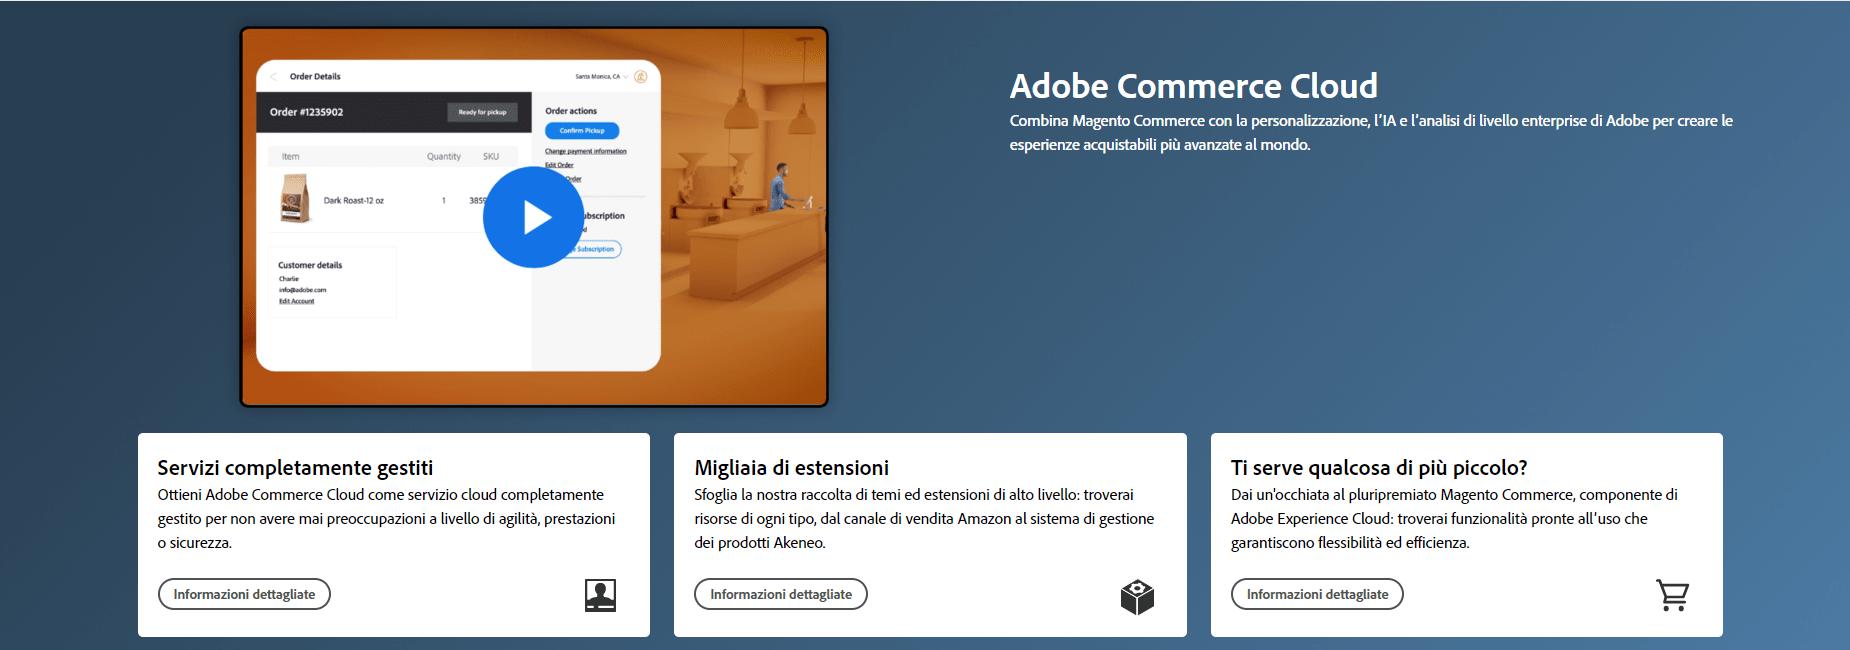 Screenshot pagina Adobe Commerce Cloud con presentazione Video